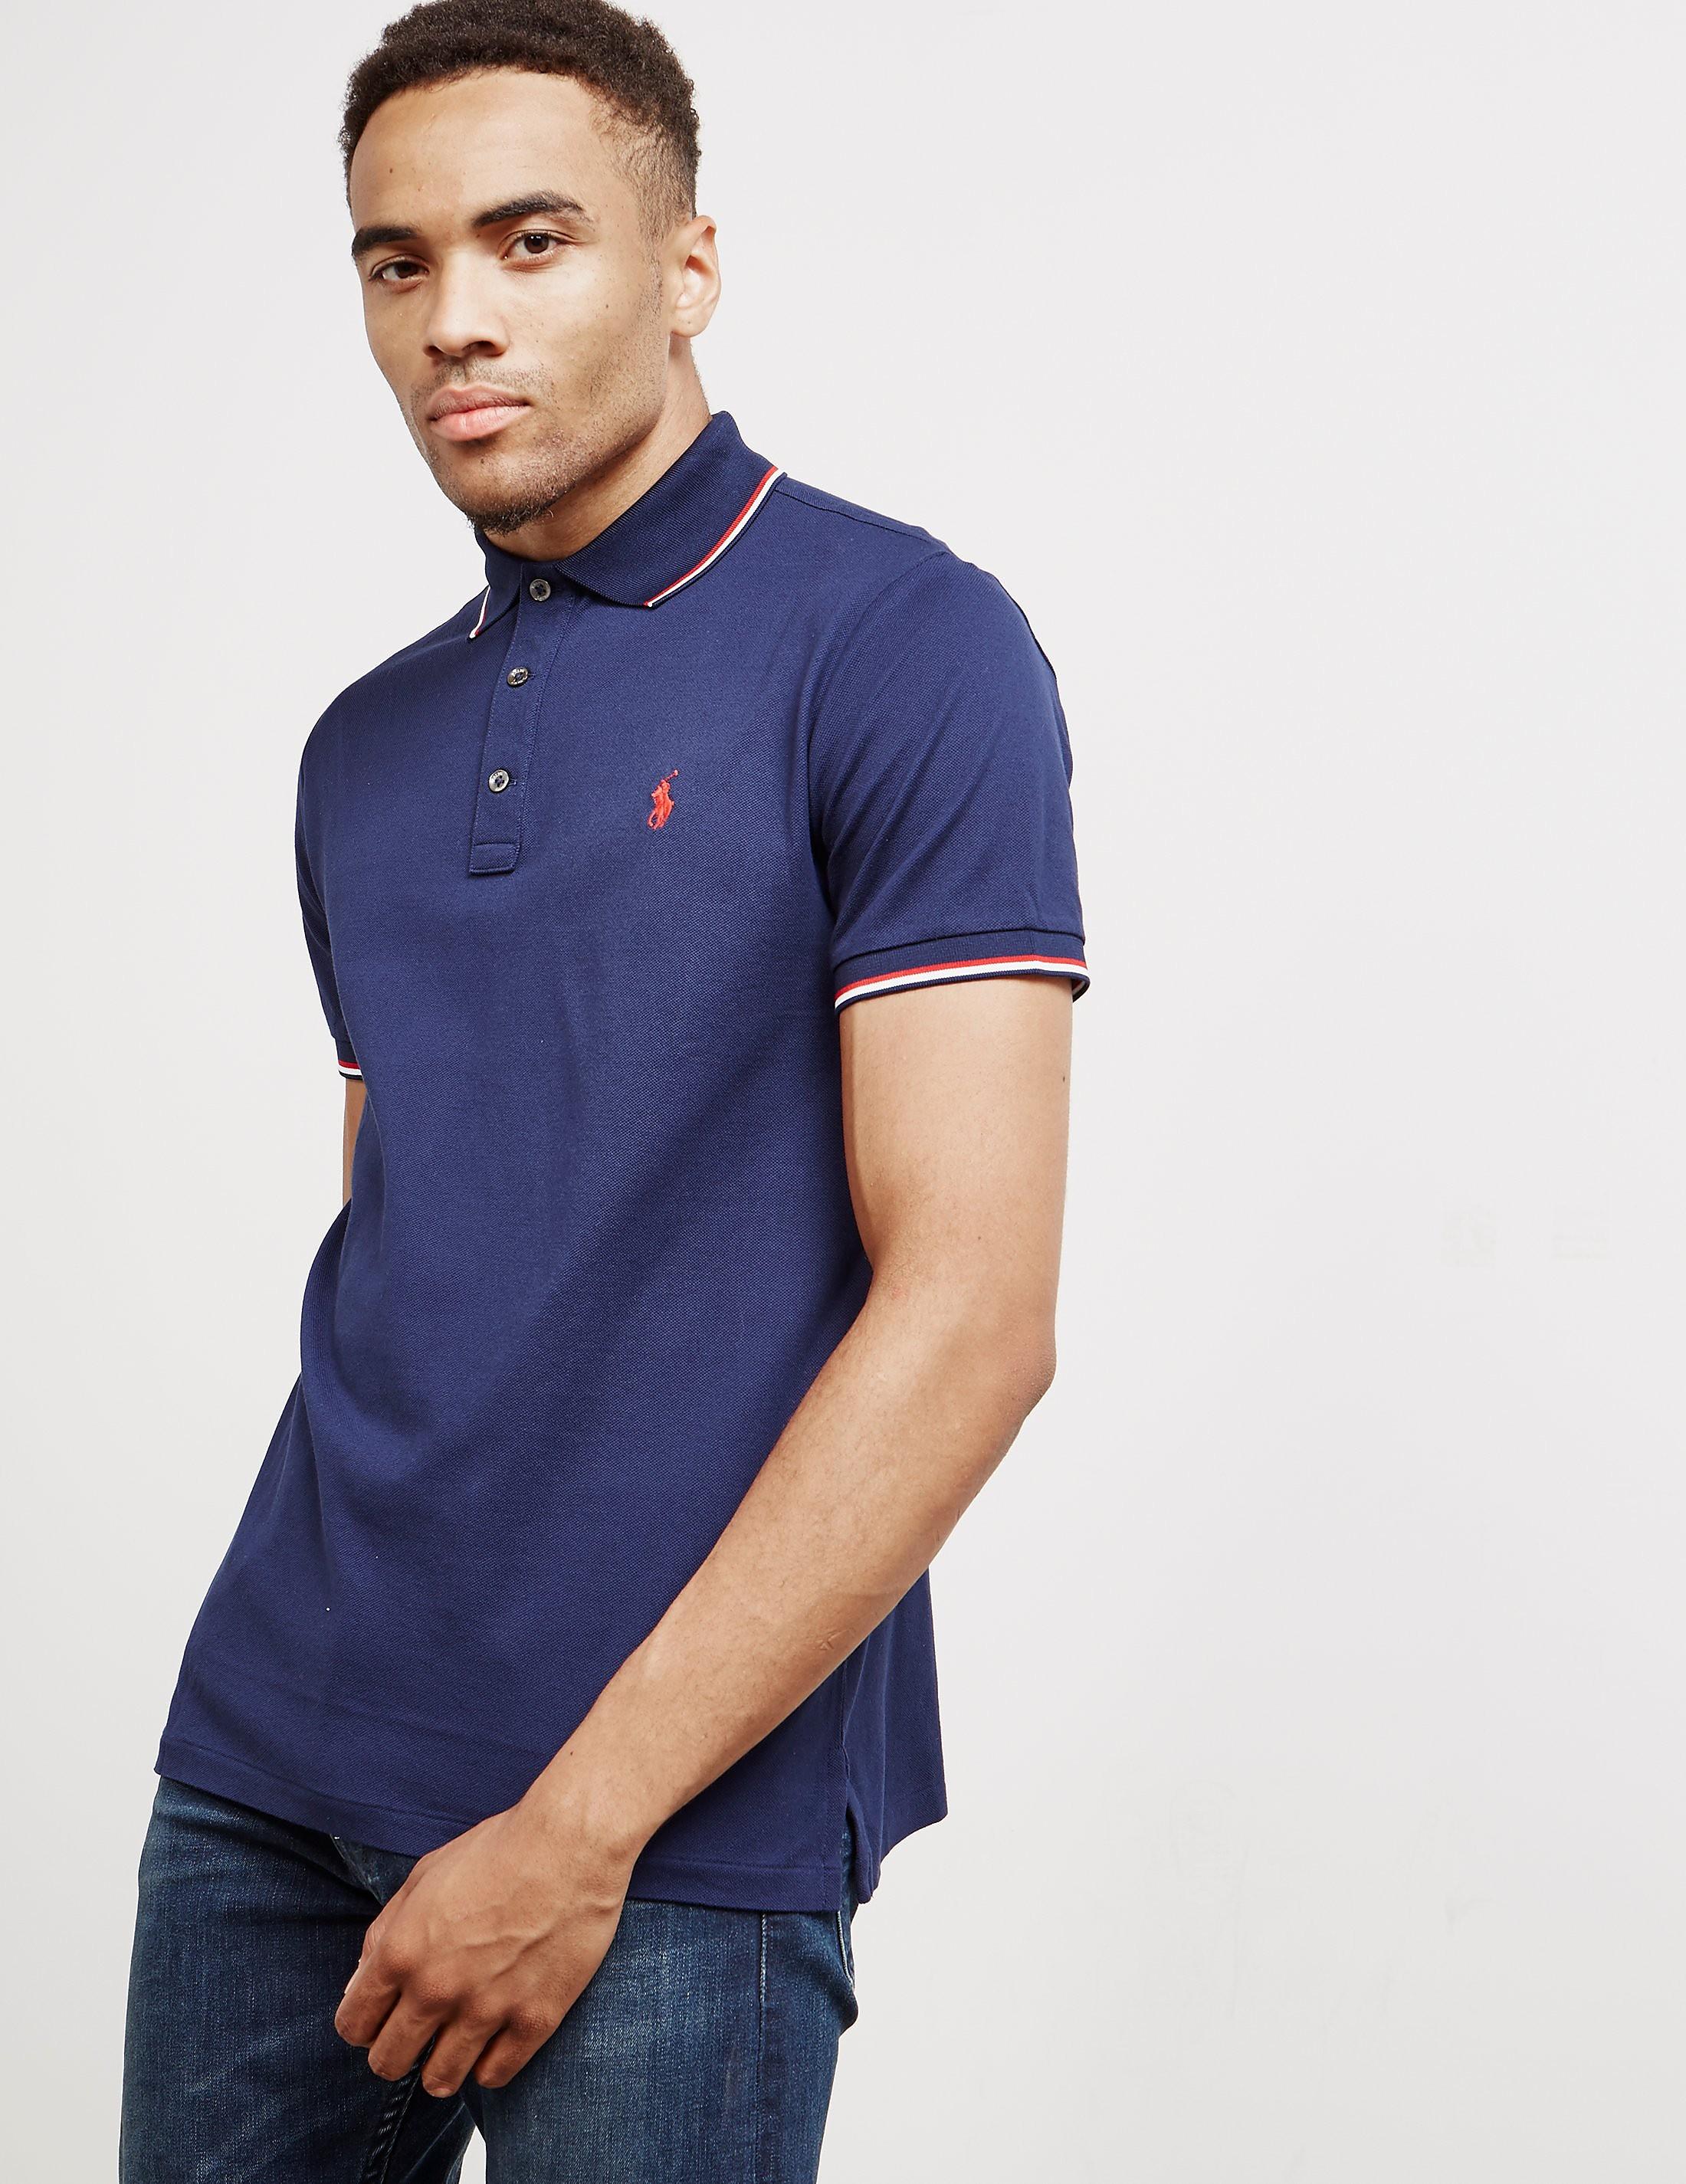 Mens Polo Ralph Lauren Tipped Short Sleeve Polo Shirt Navy Blue